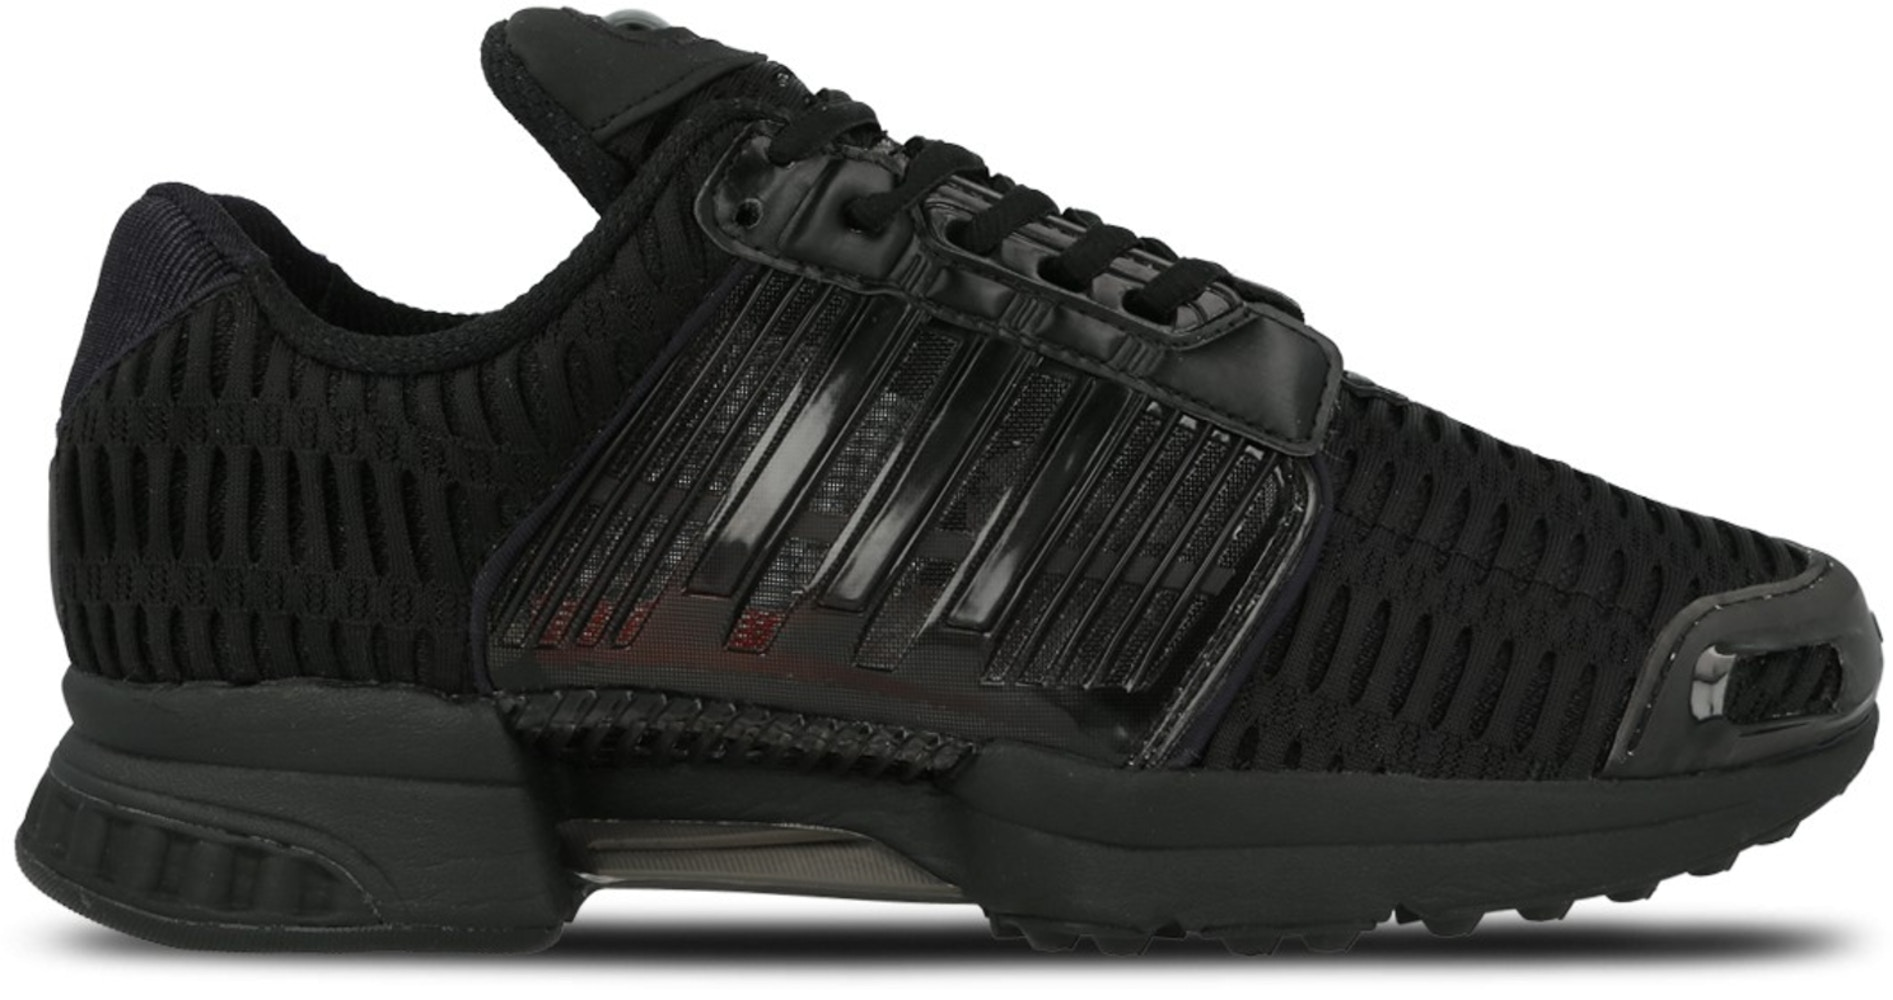 adidas Climacool Shoe Gallery Flight 305